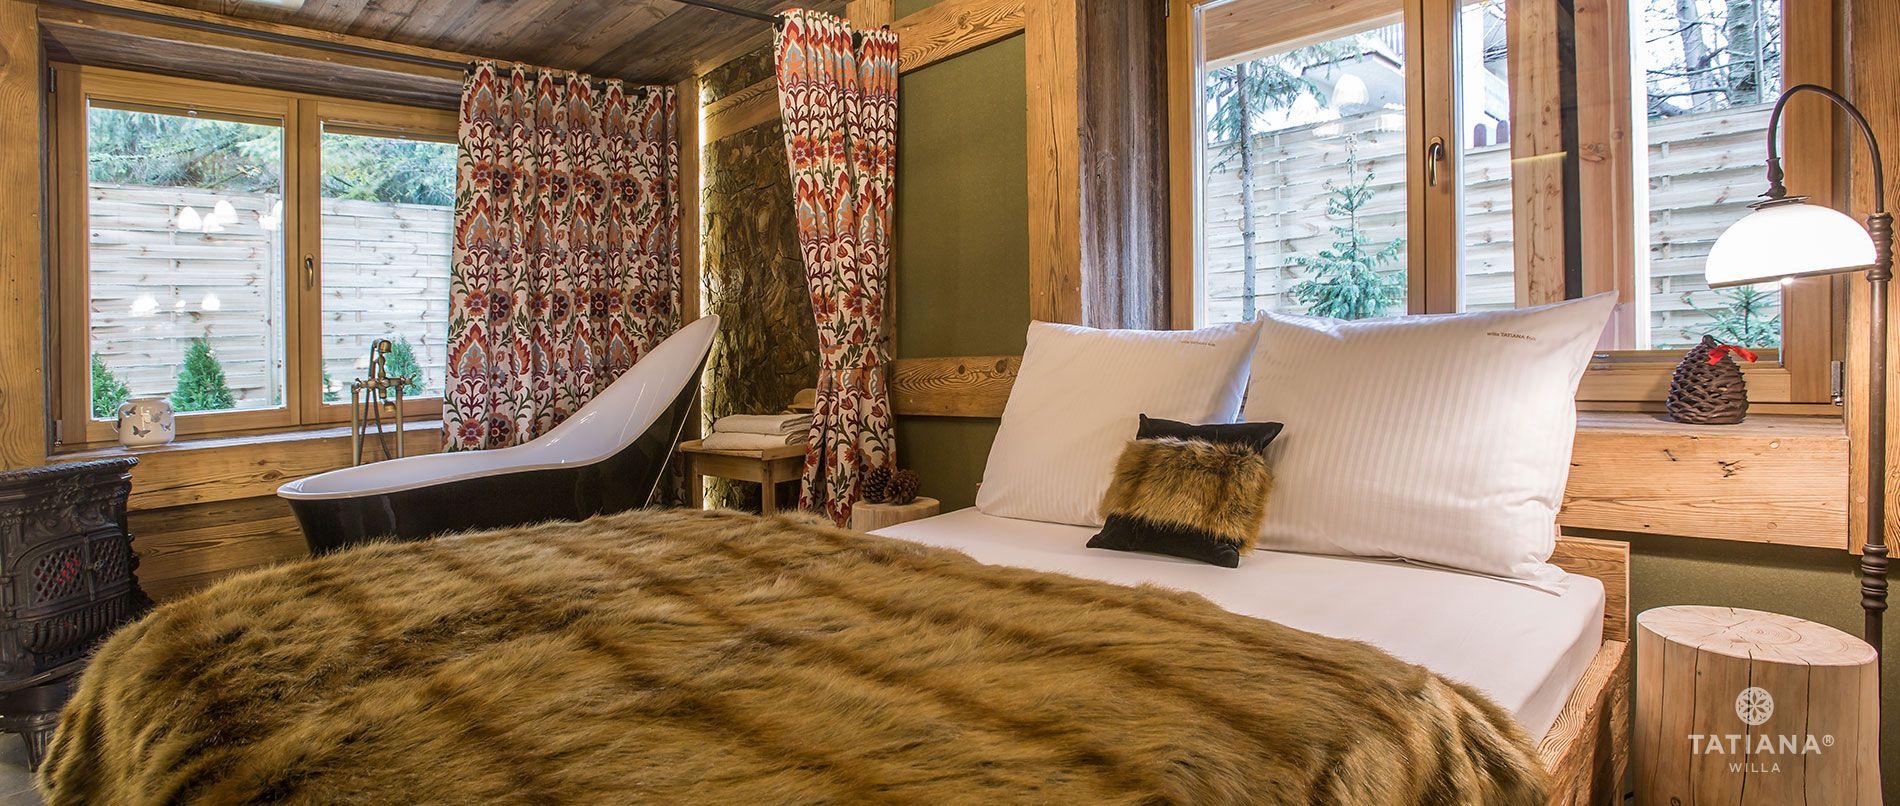 Apartament Karpacki- druga sypialnia